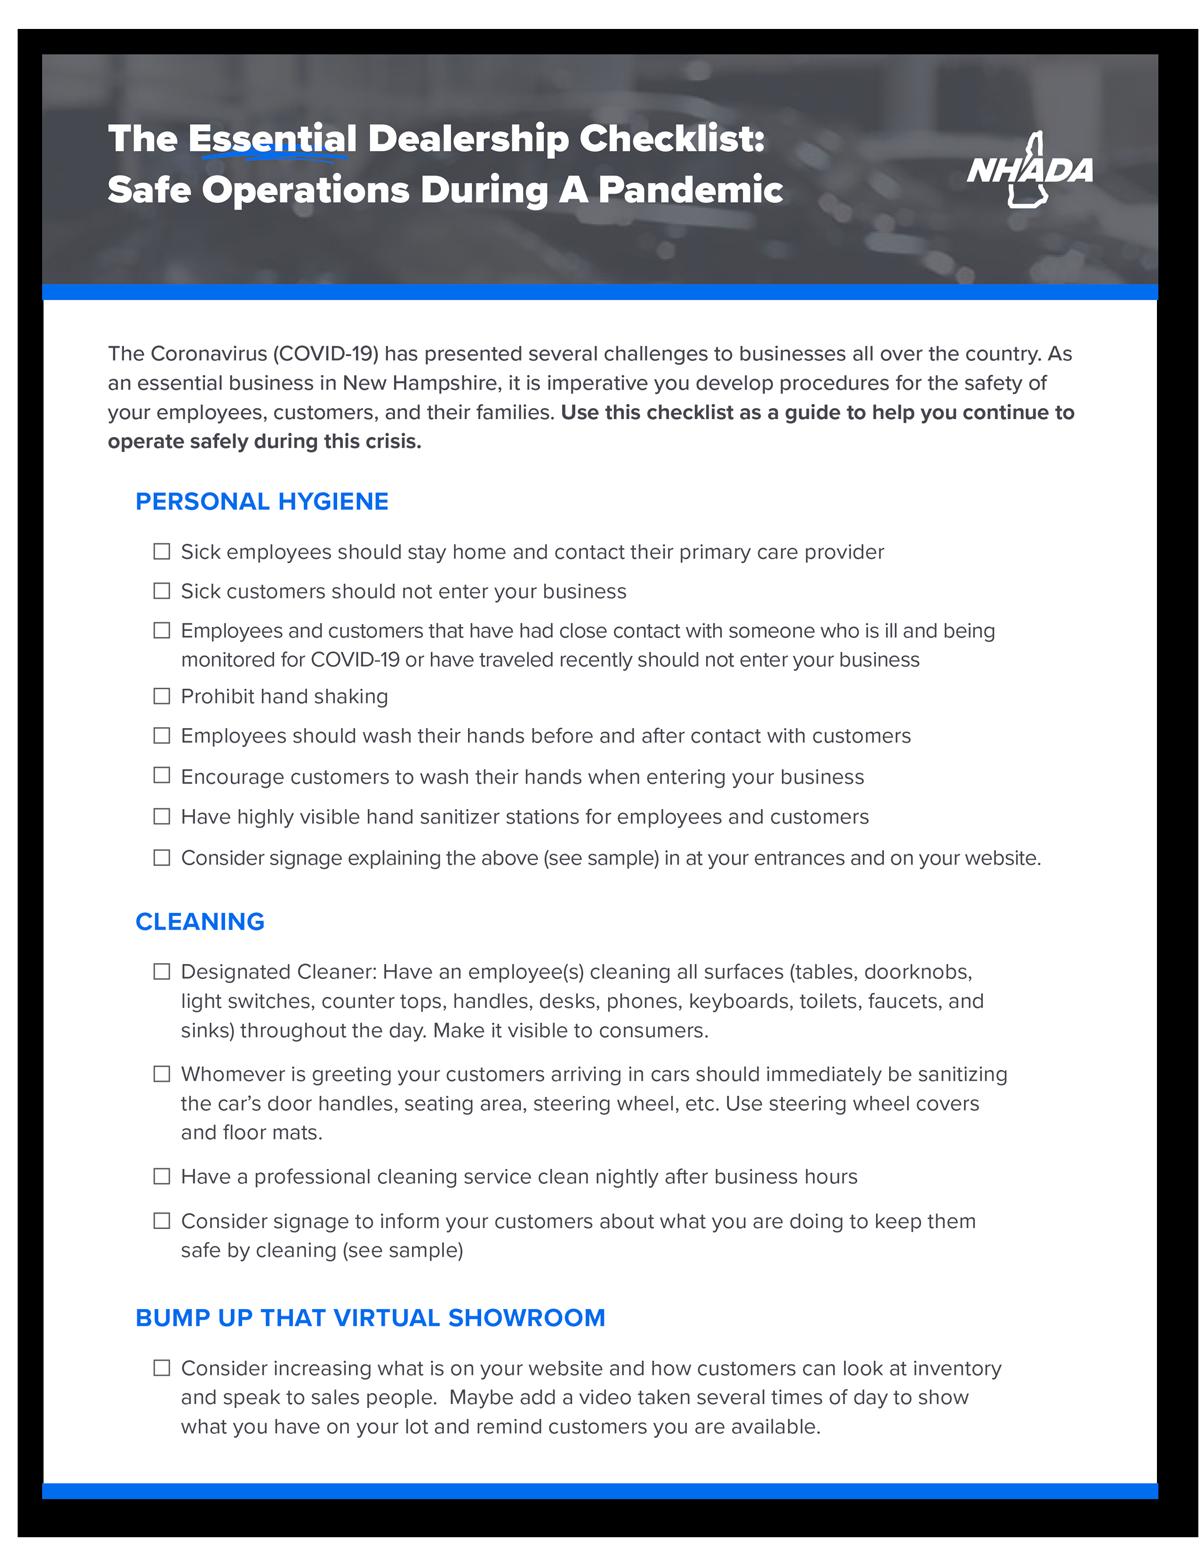 Safe Operations Checklist